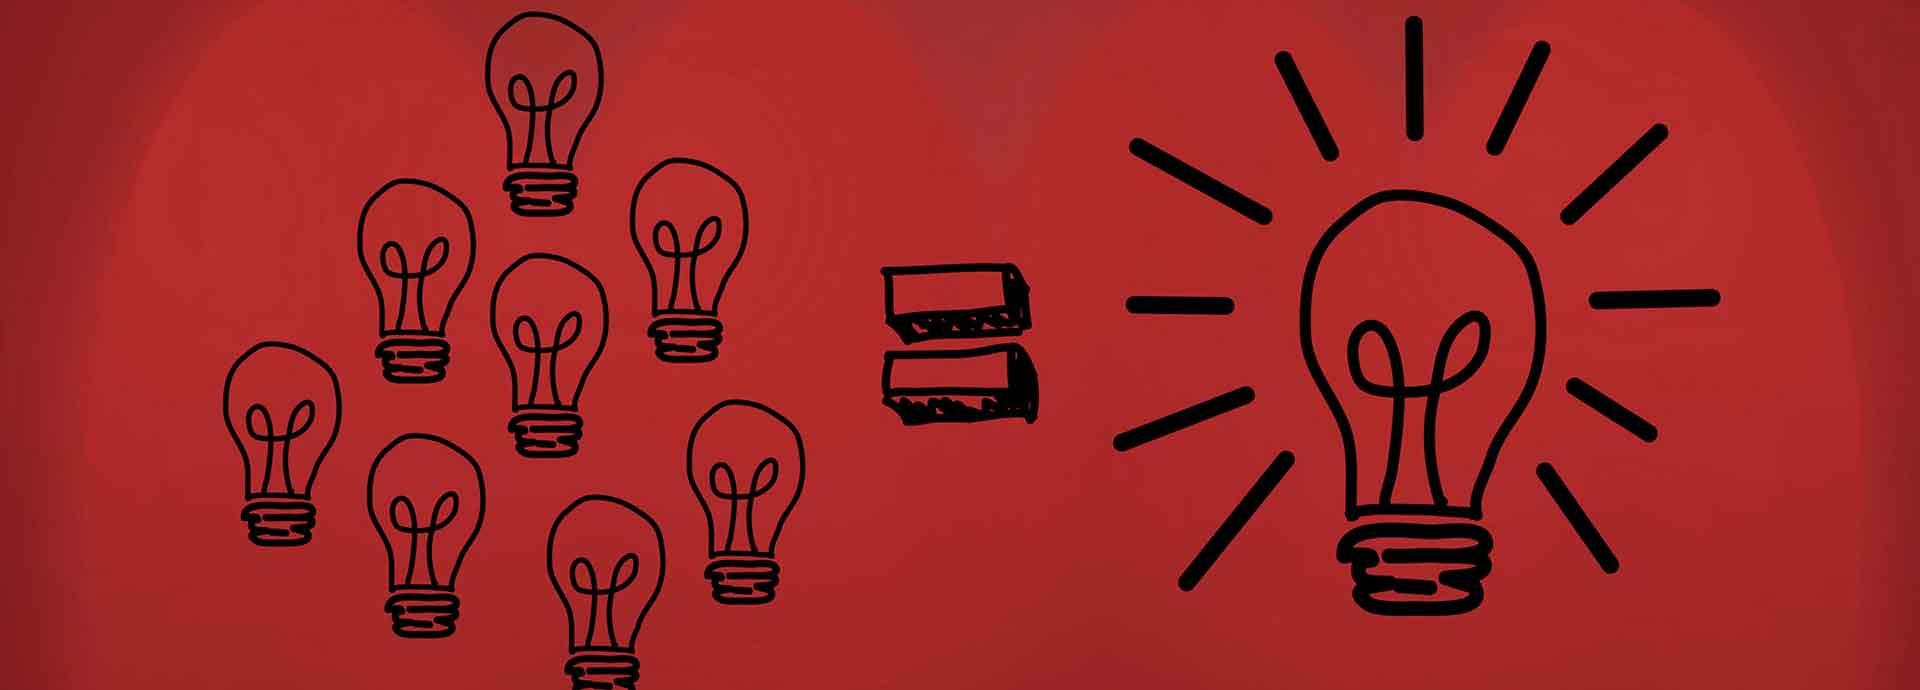 ahorrar_iluminacion_ofertas